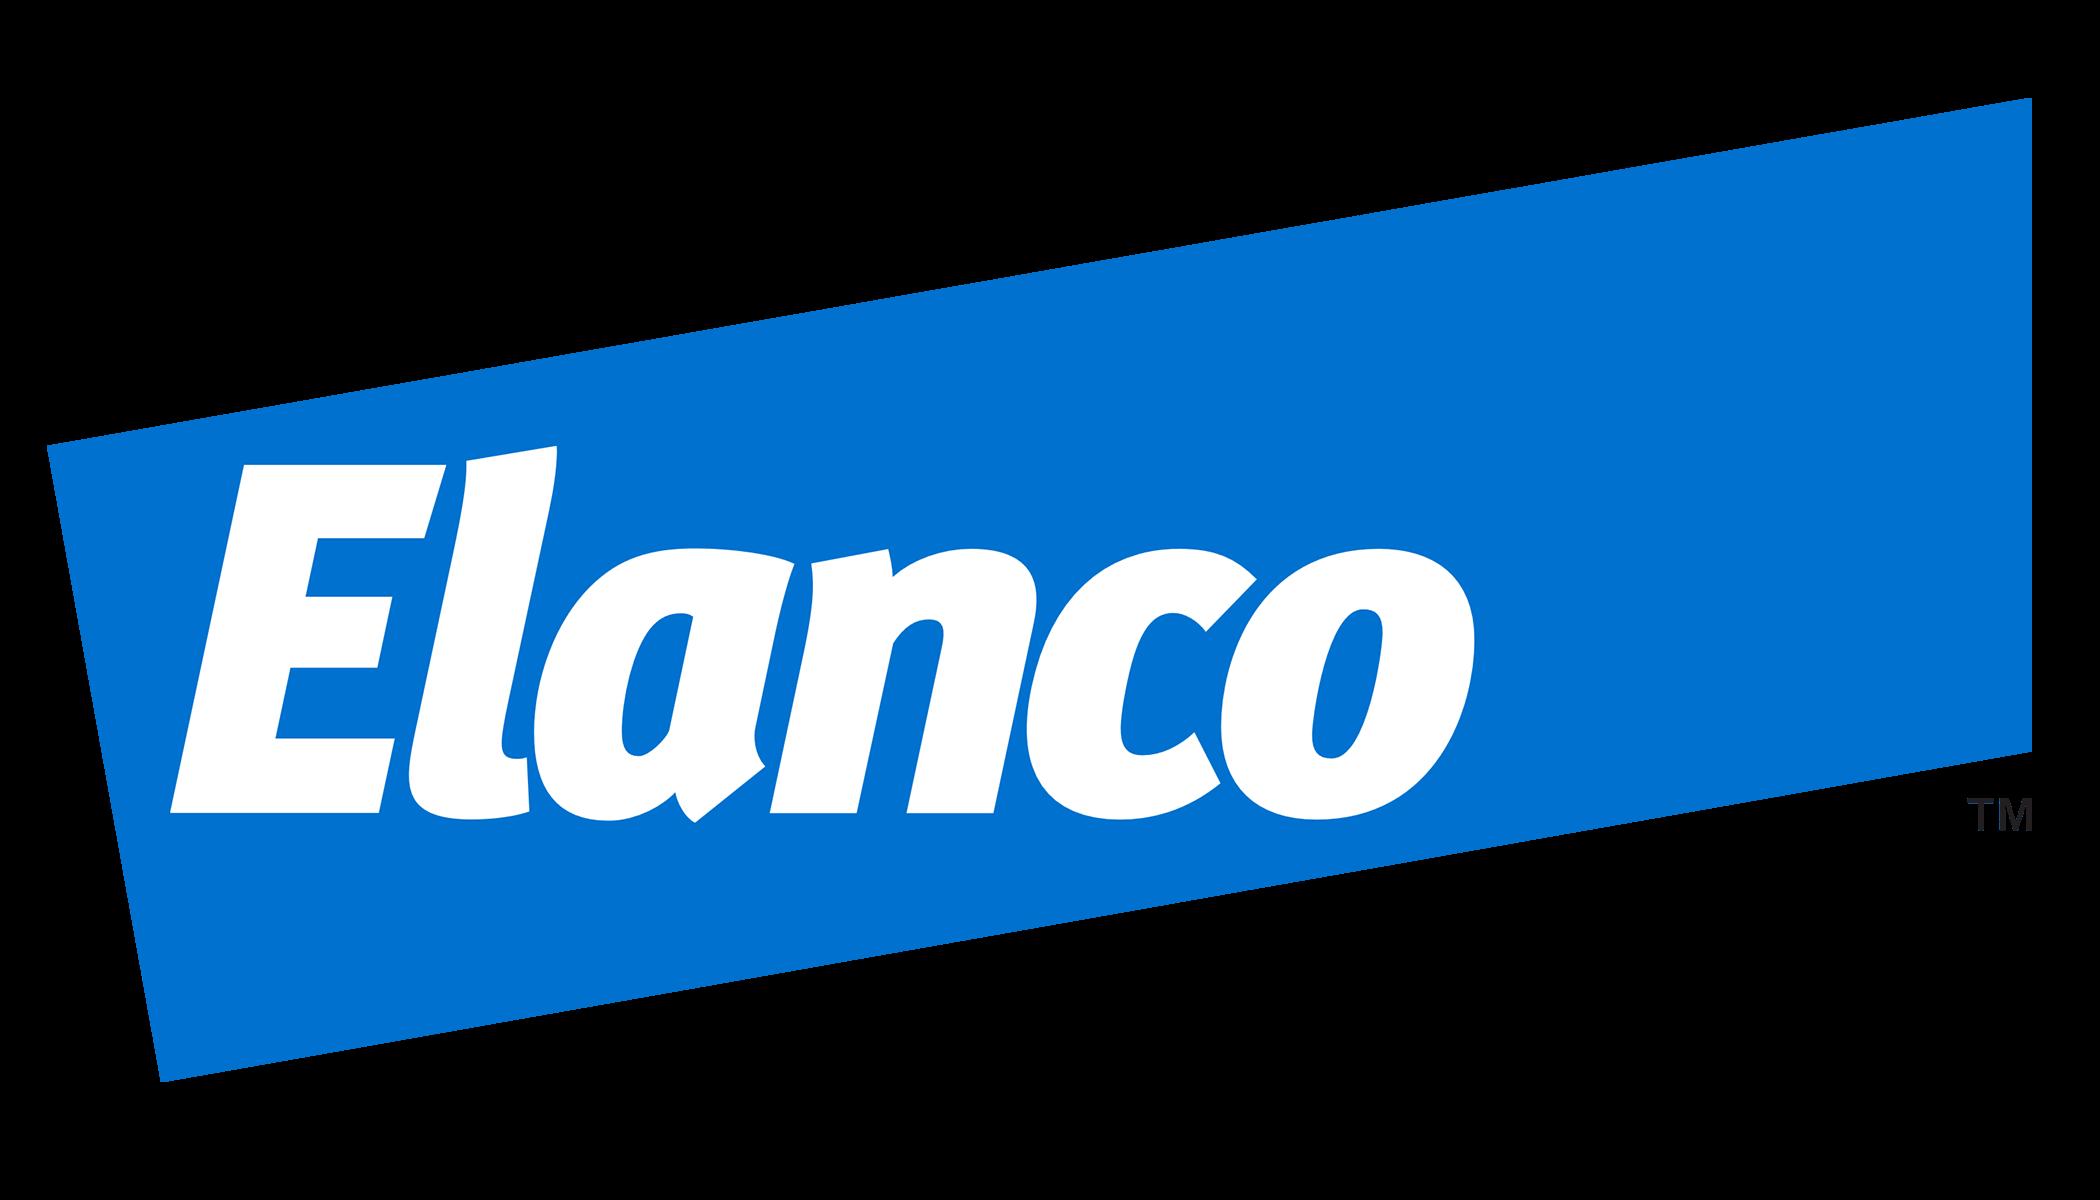 Elanco